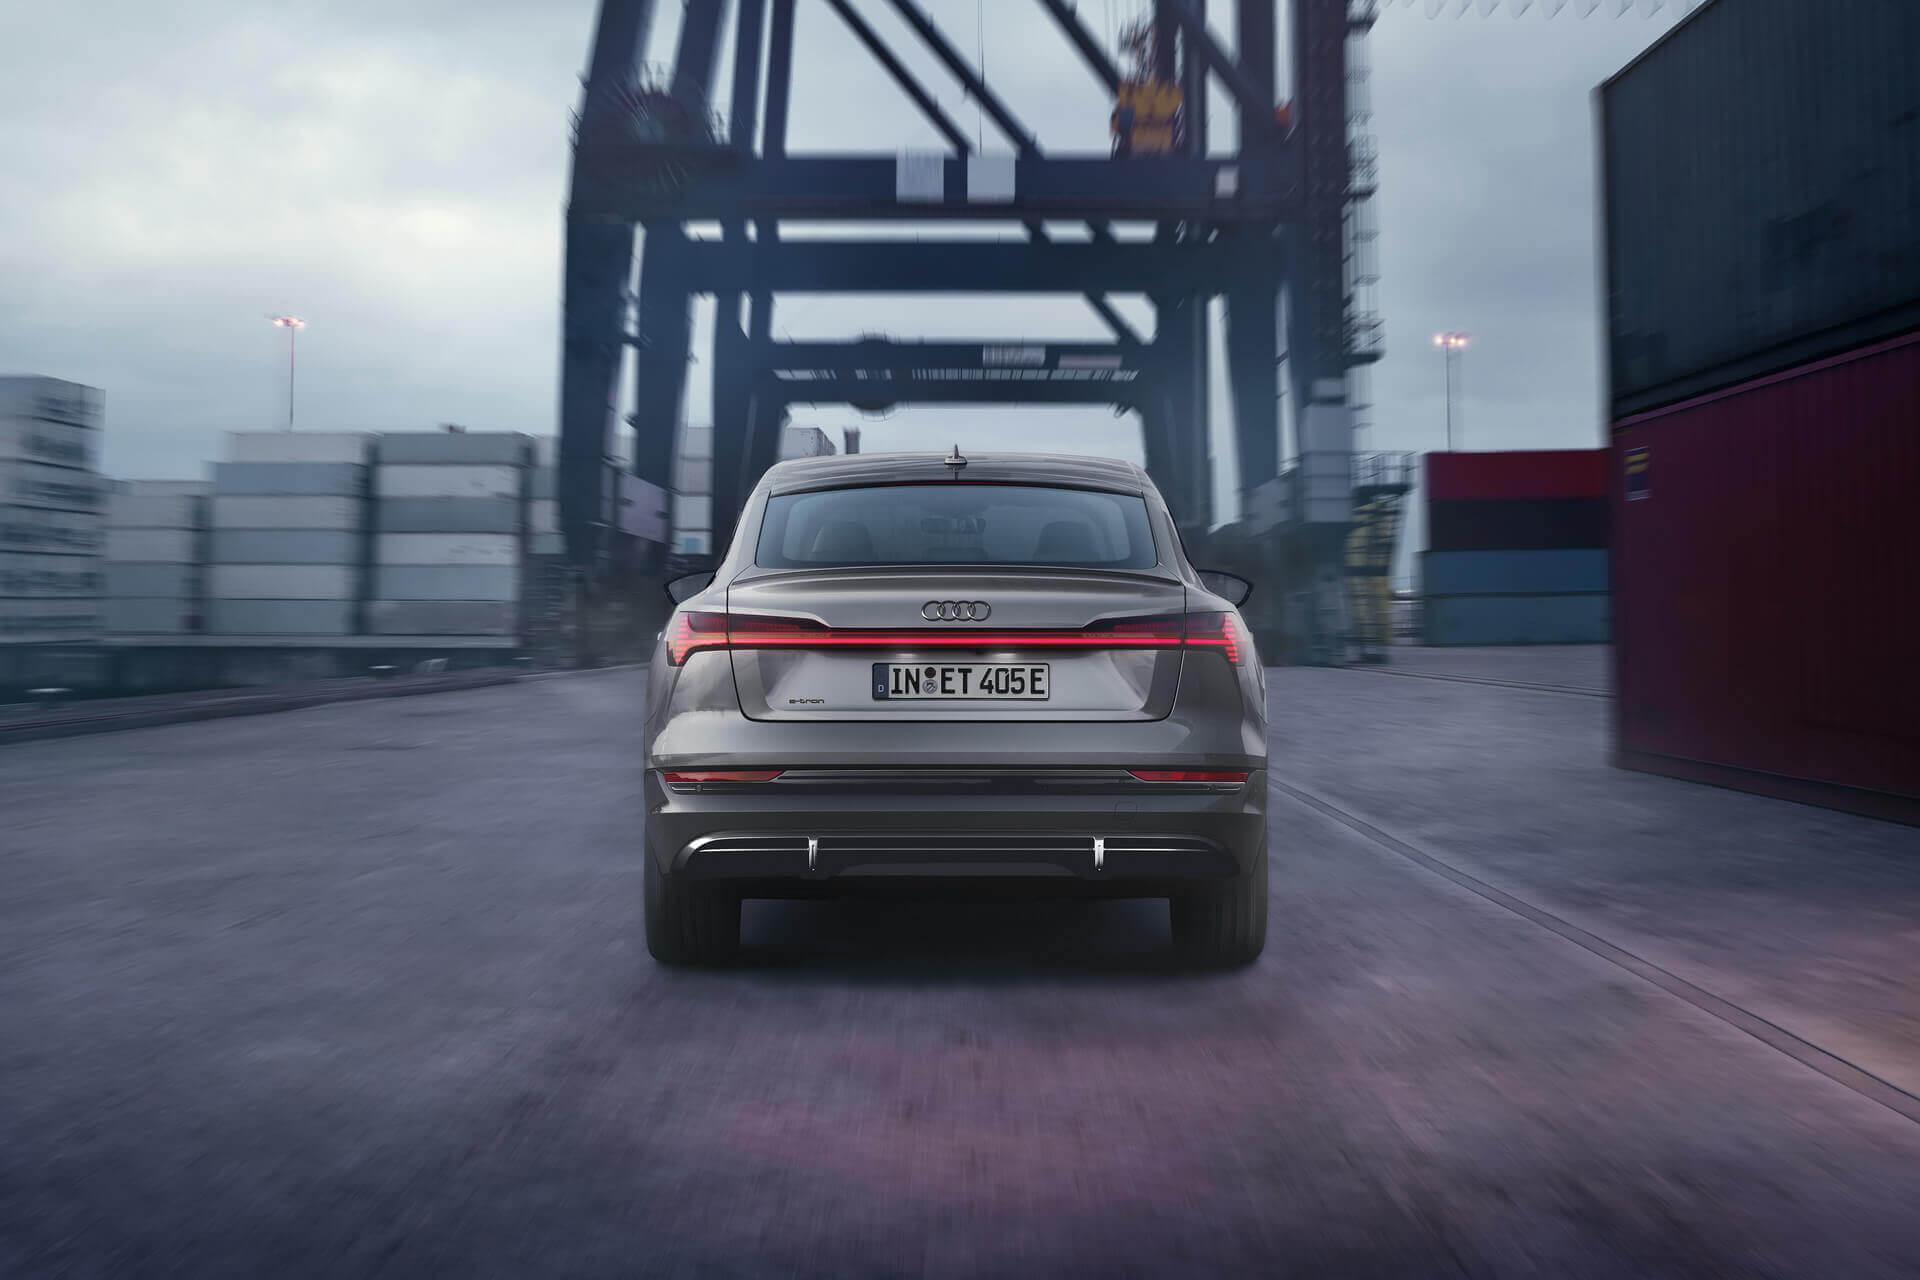 Новая серия S line black edition доступна для Audi e-tron quattro и Audi e-tron Sportback